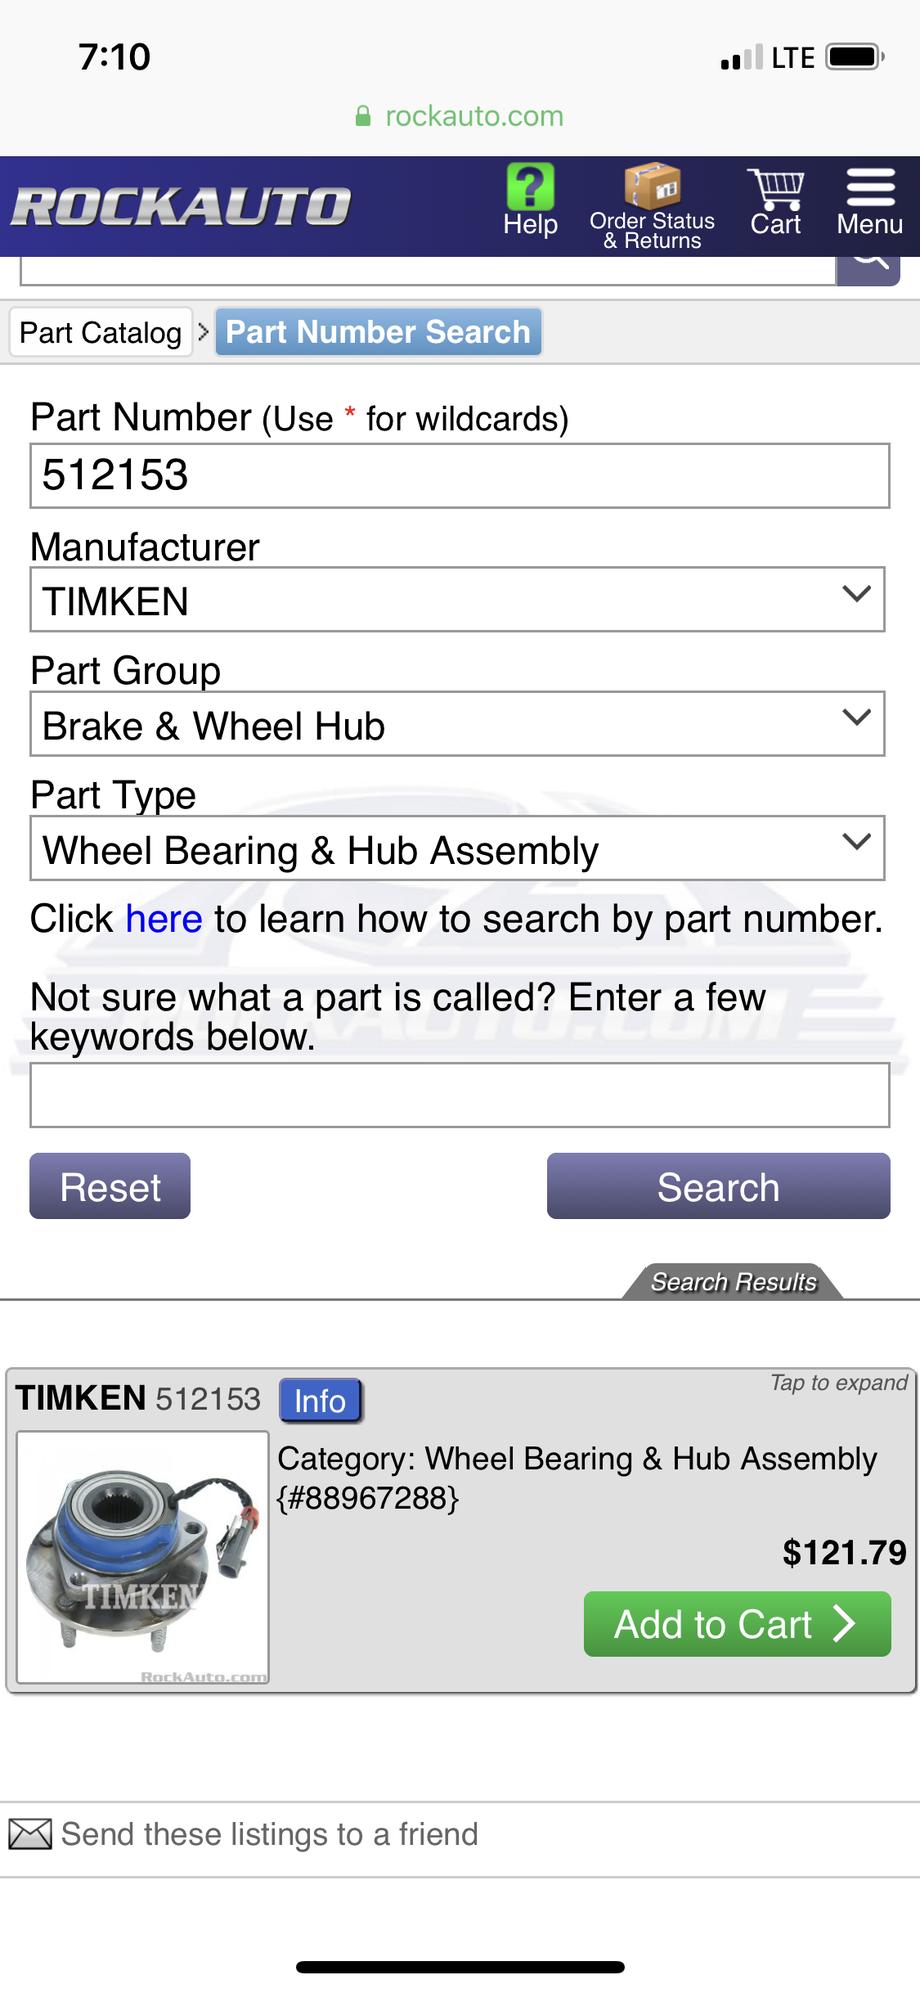 Learn From My Misfortune: Garbage Timken Wheel Bearing